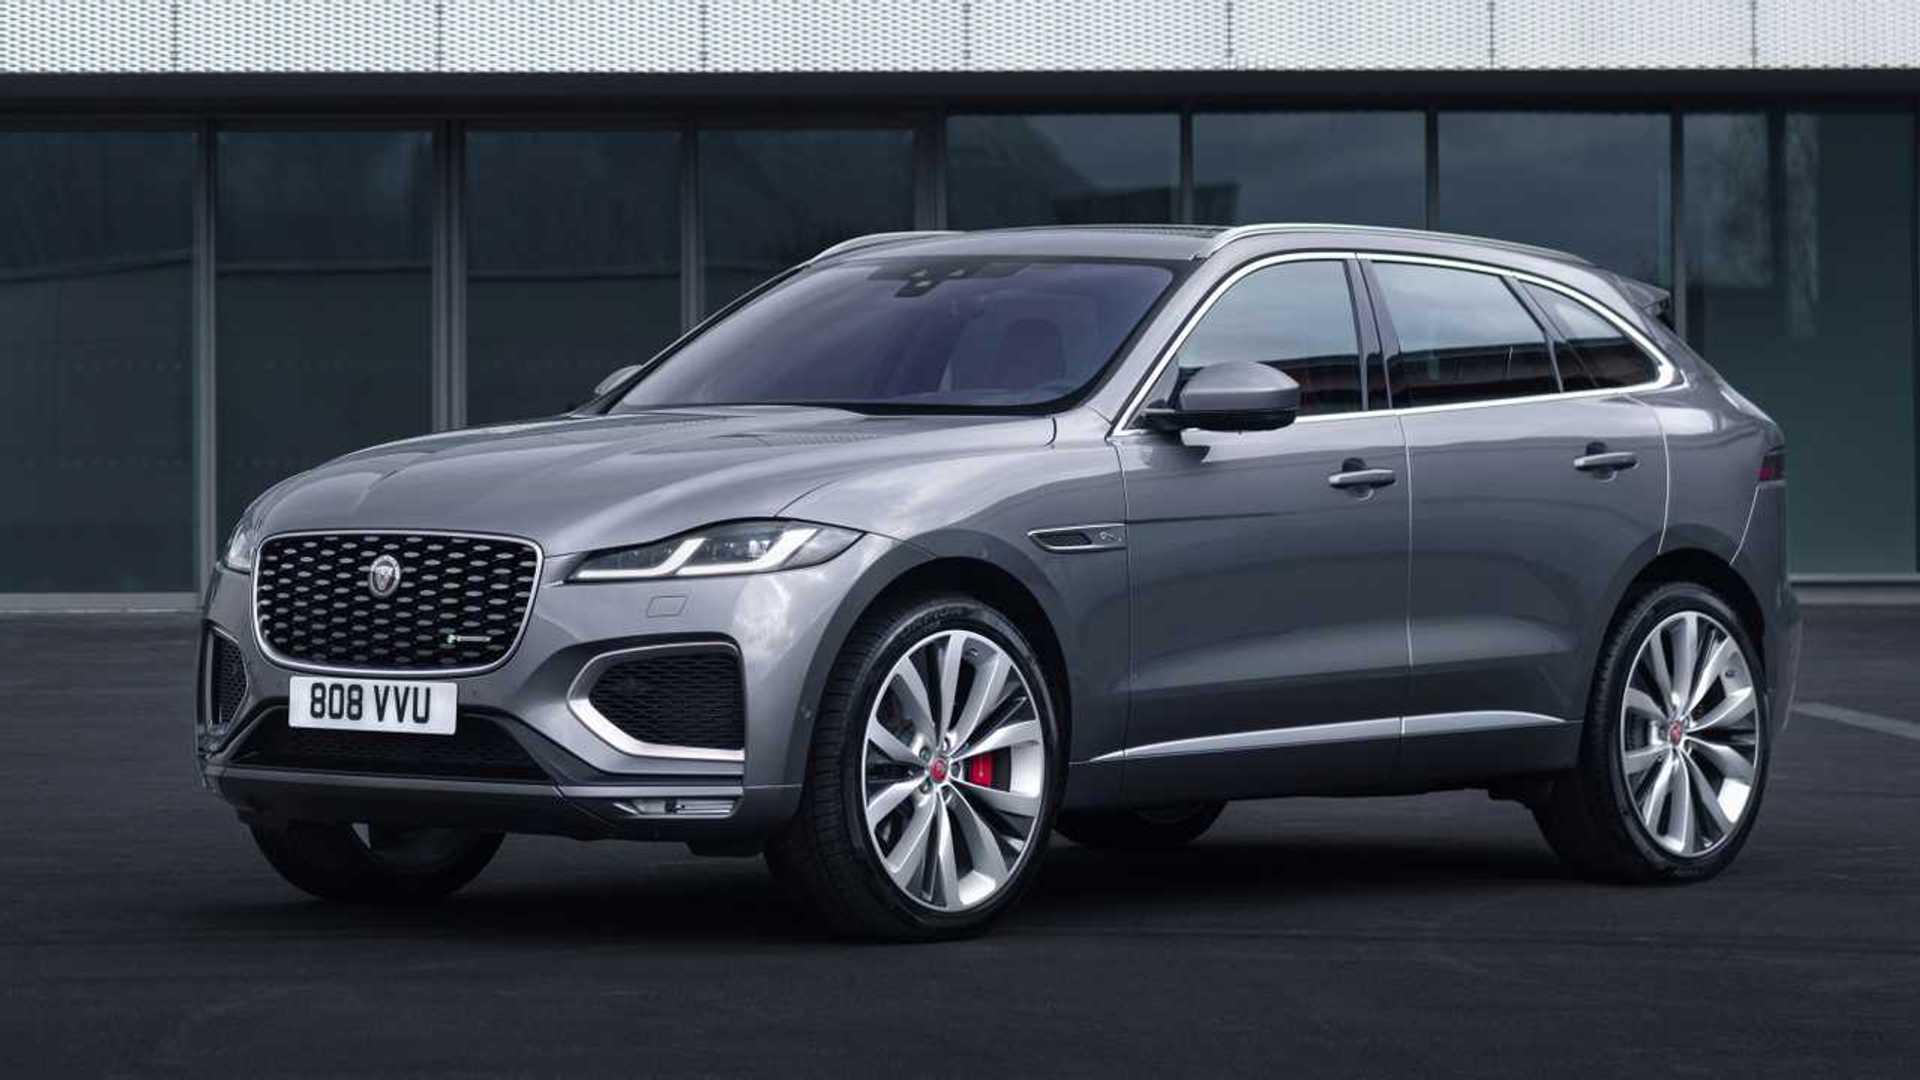 New Jaguar F Pace 2021 Release Date